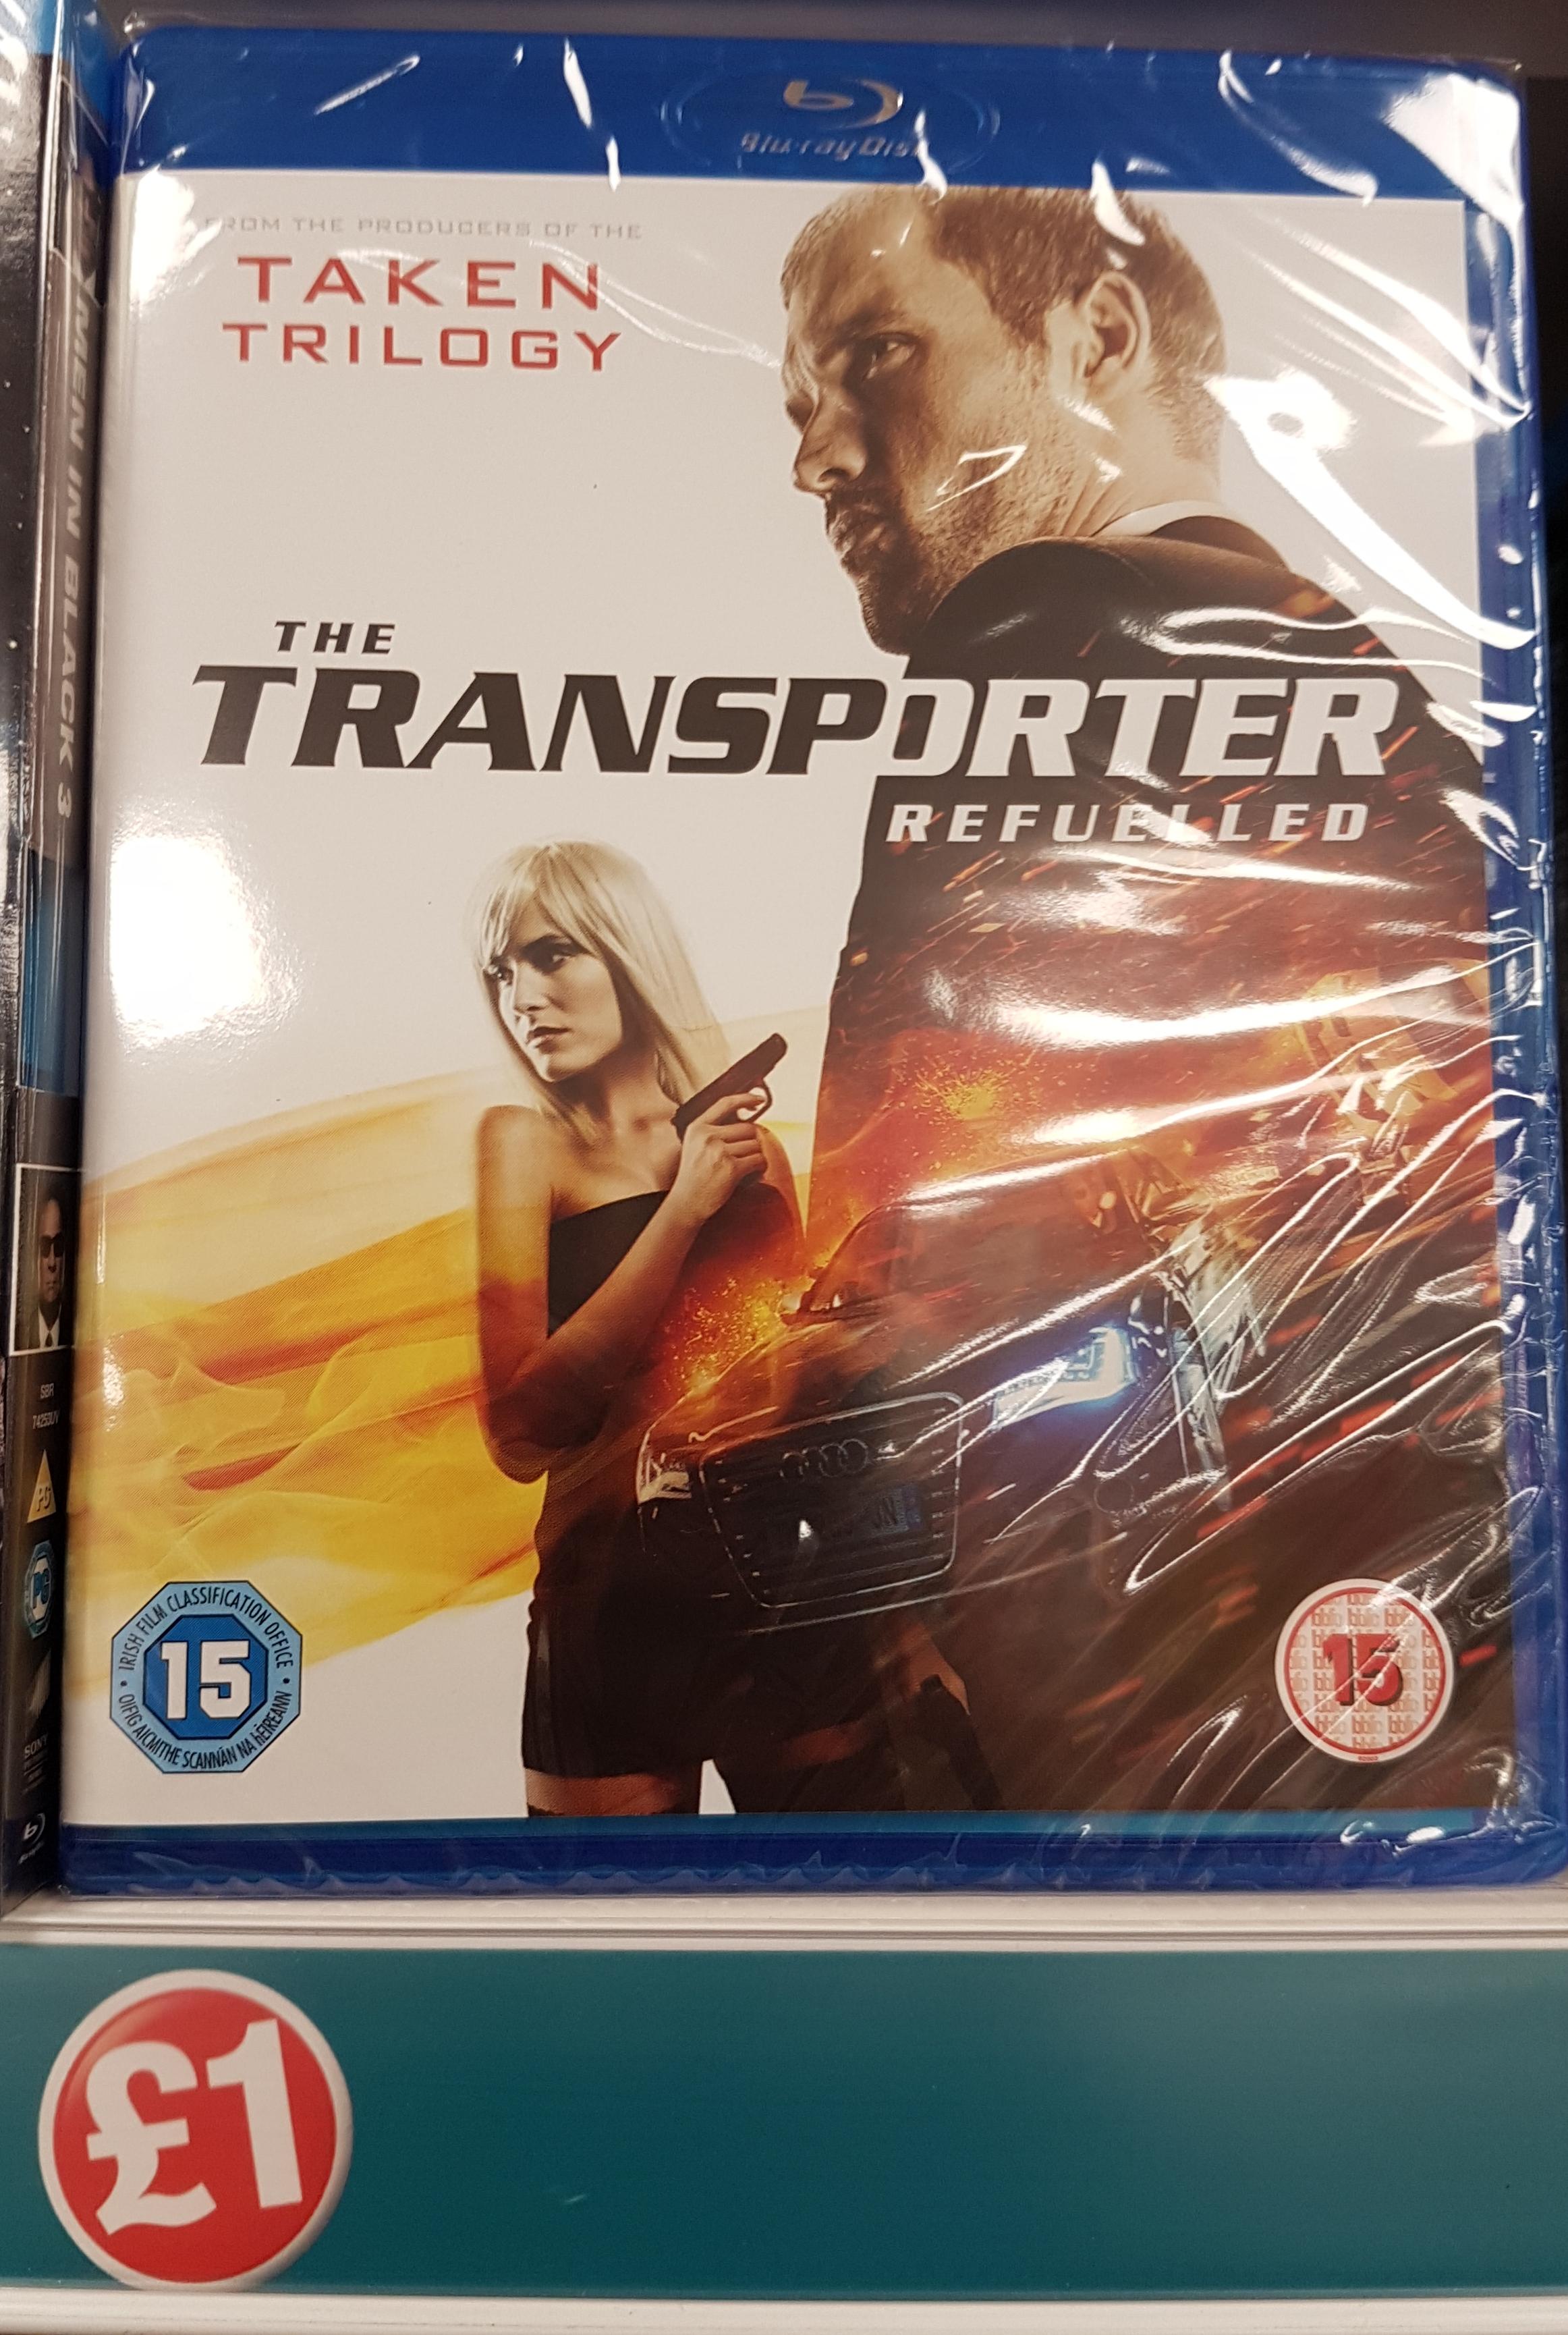 The Transporter Refuelled Blu-Ray £1 @ Poundland